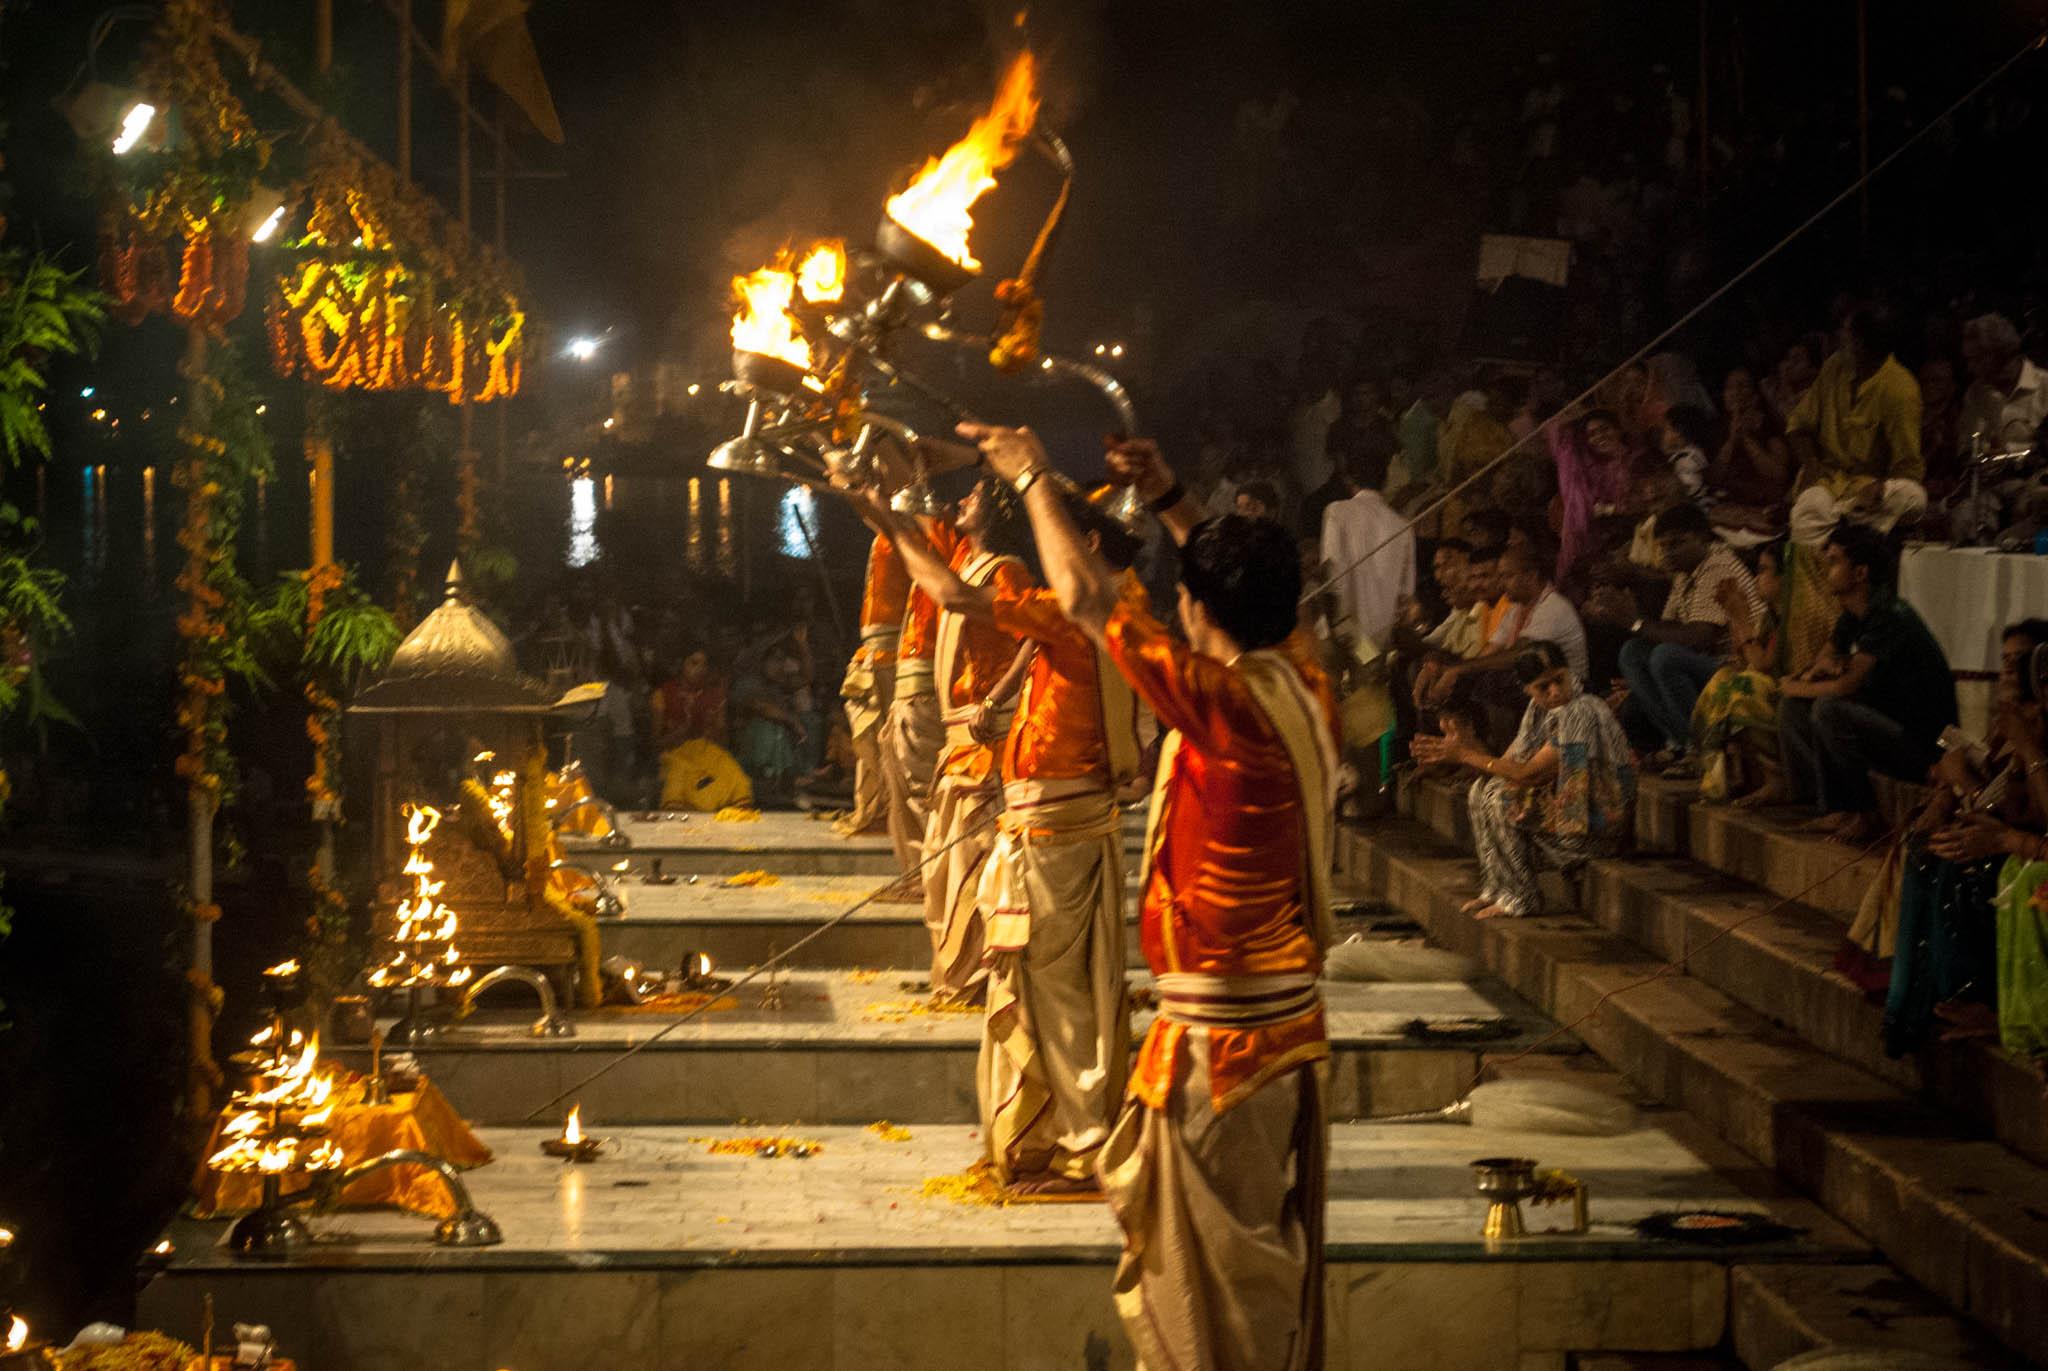 File:Ganga Aarti in evening at Dashashwamedh ghat, Varanasi 5.jpg - Wikimedia Commons